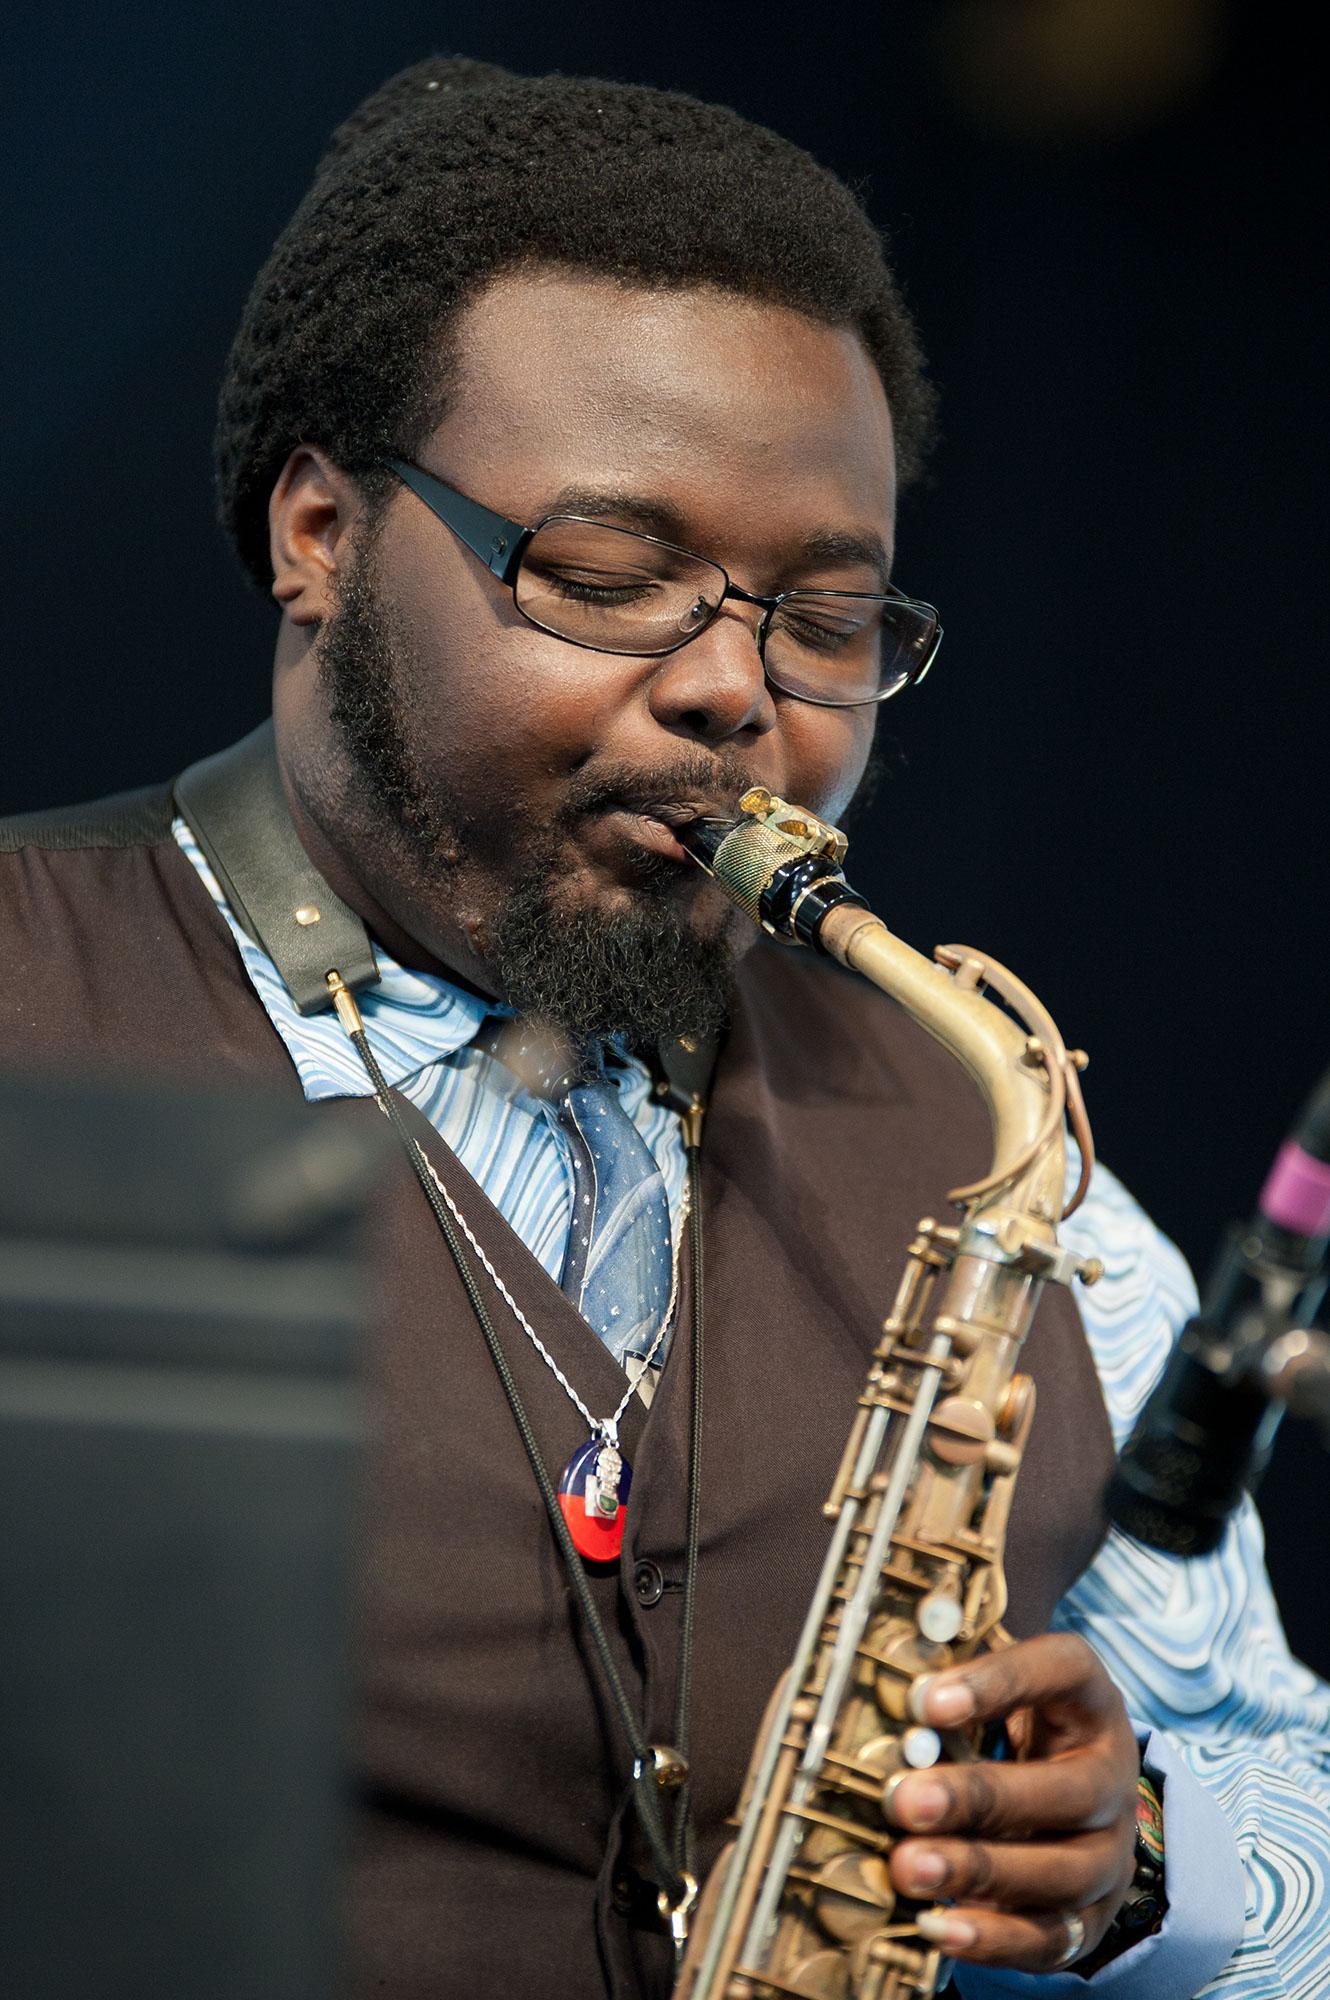 Godwin Louis - Thelonius Monk Institute of Jazz